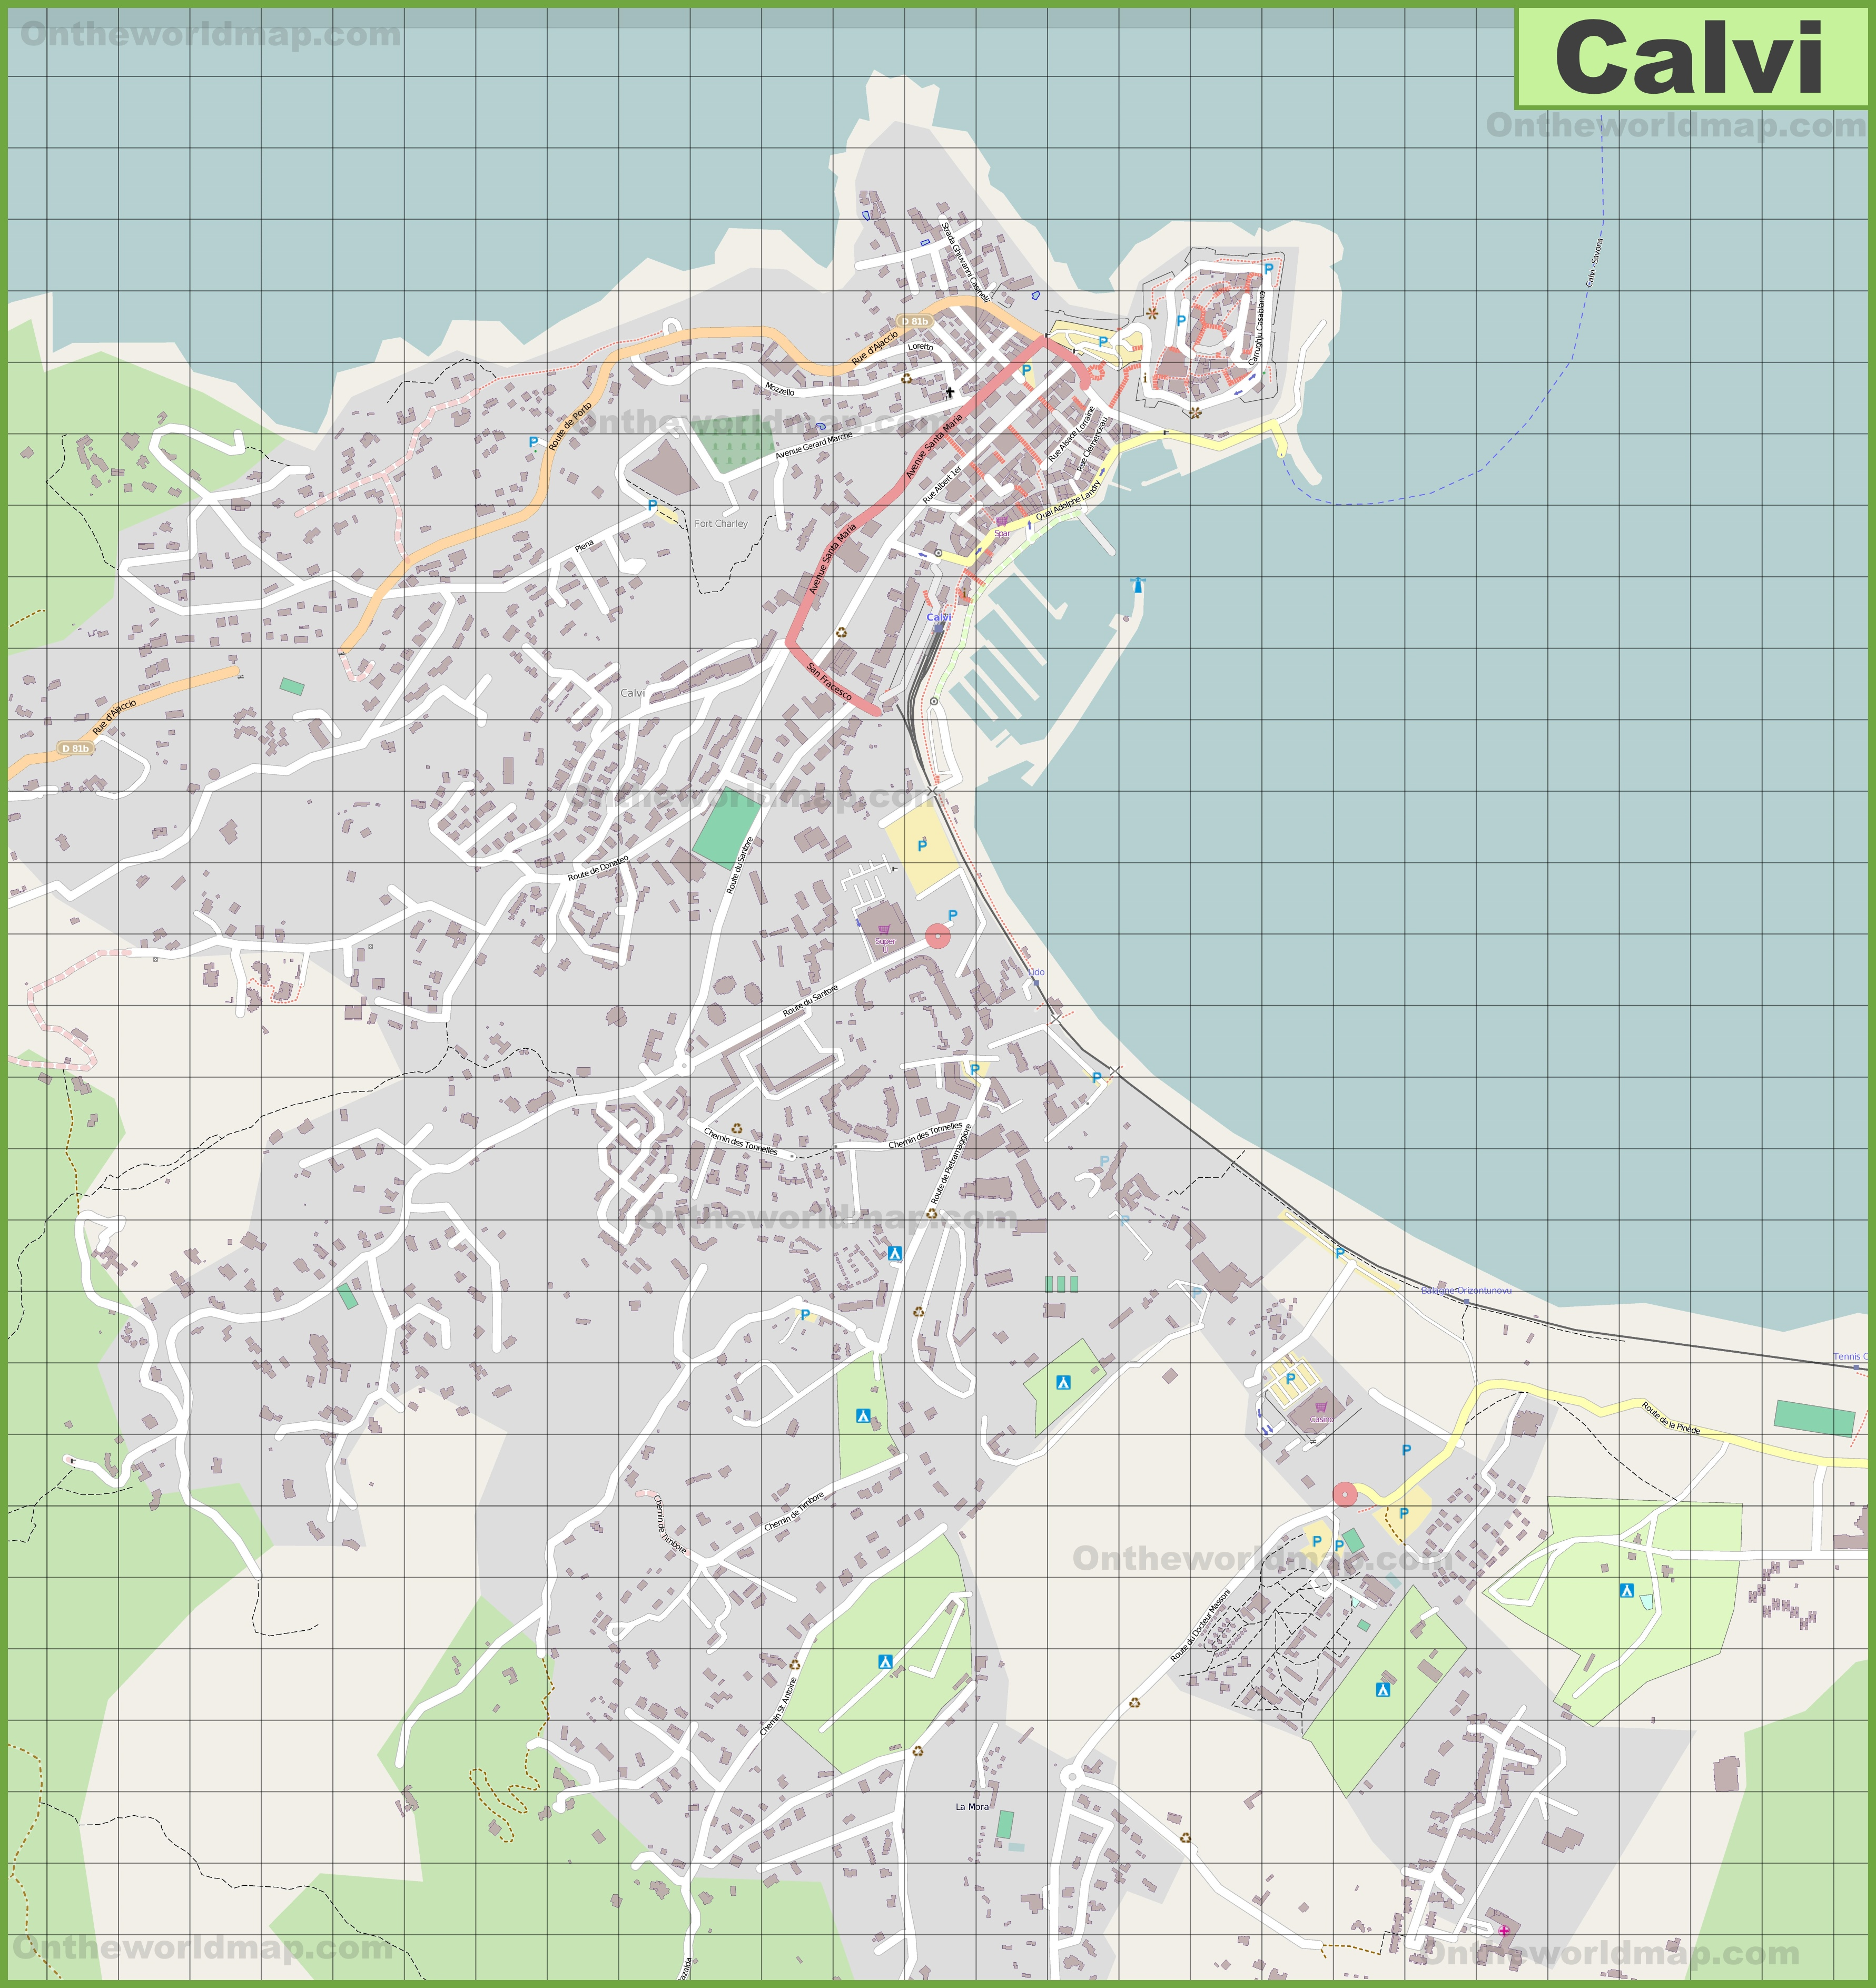 Detailed map of Calvi